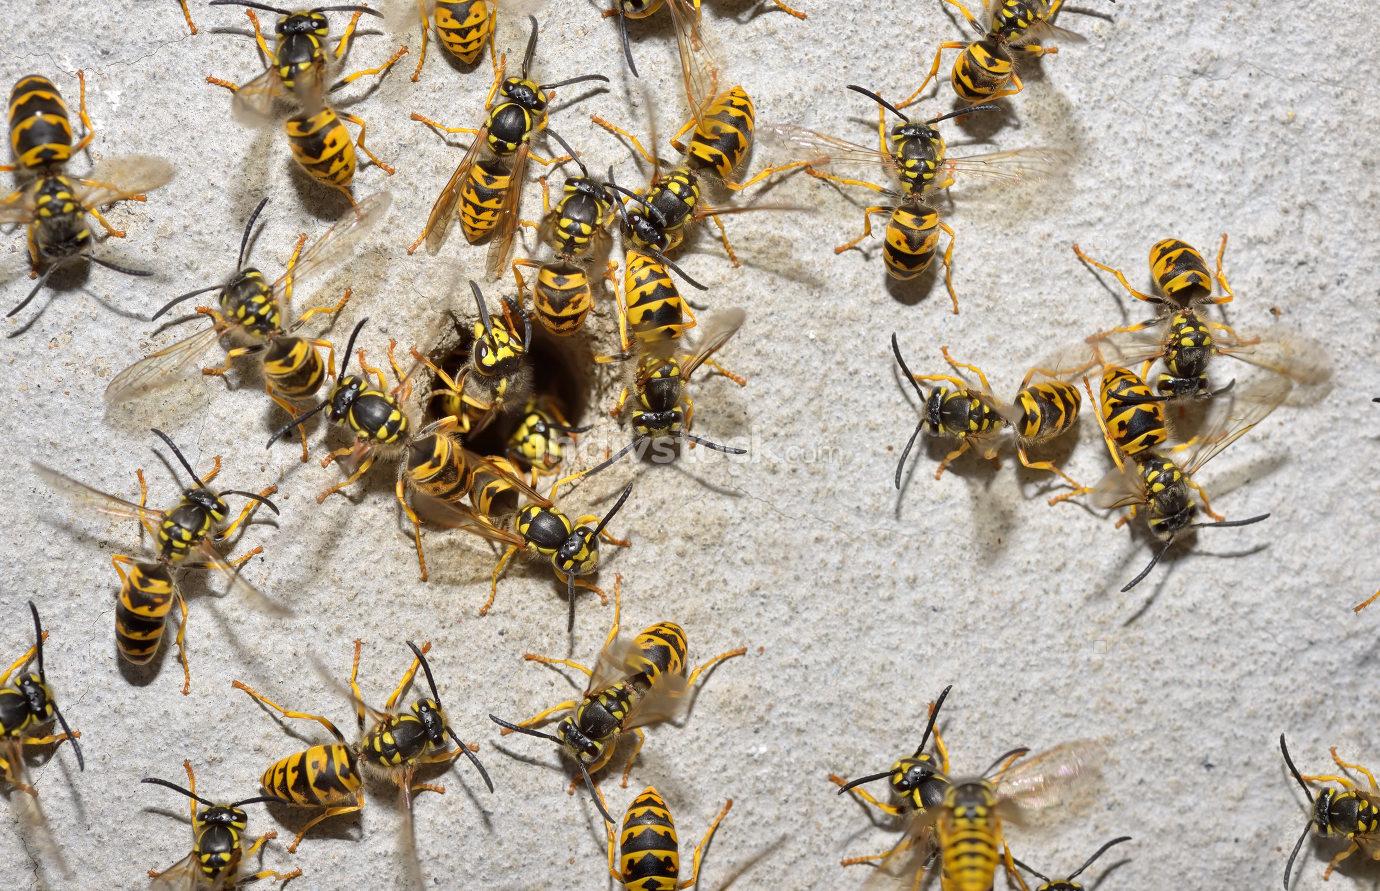 Wasp nest macro